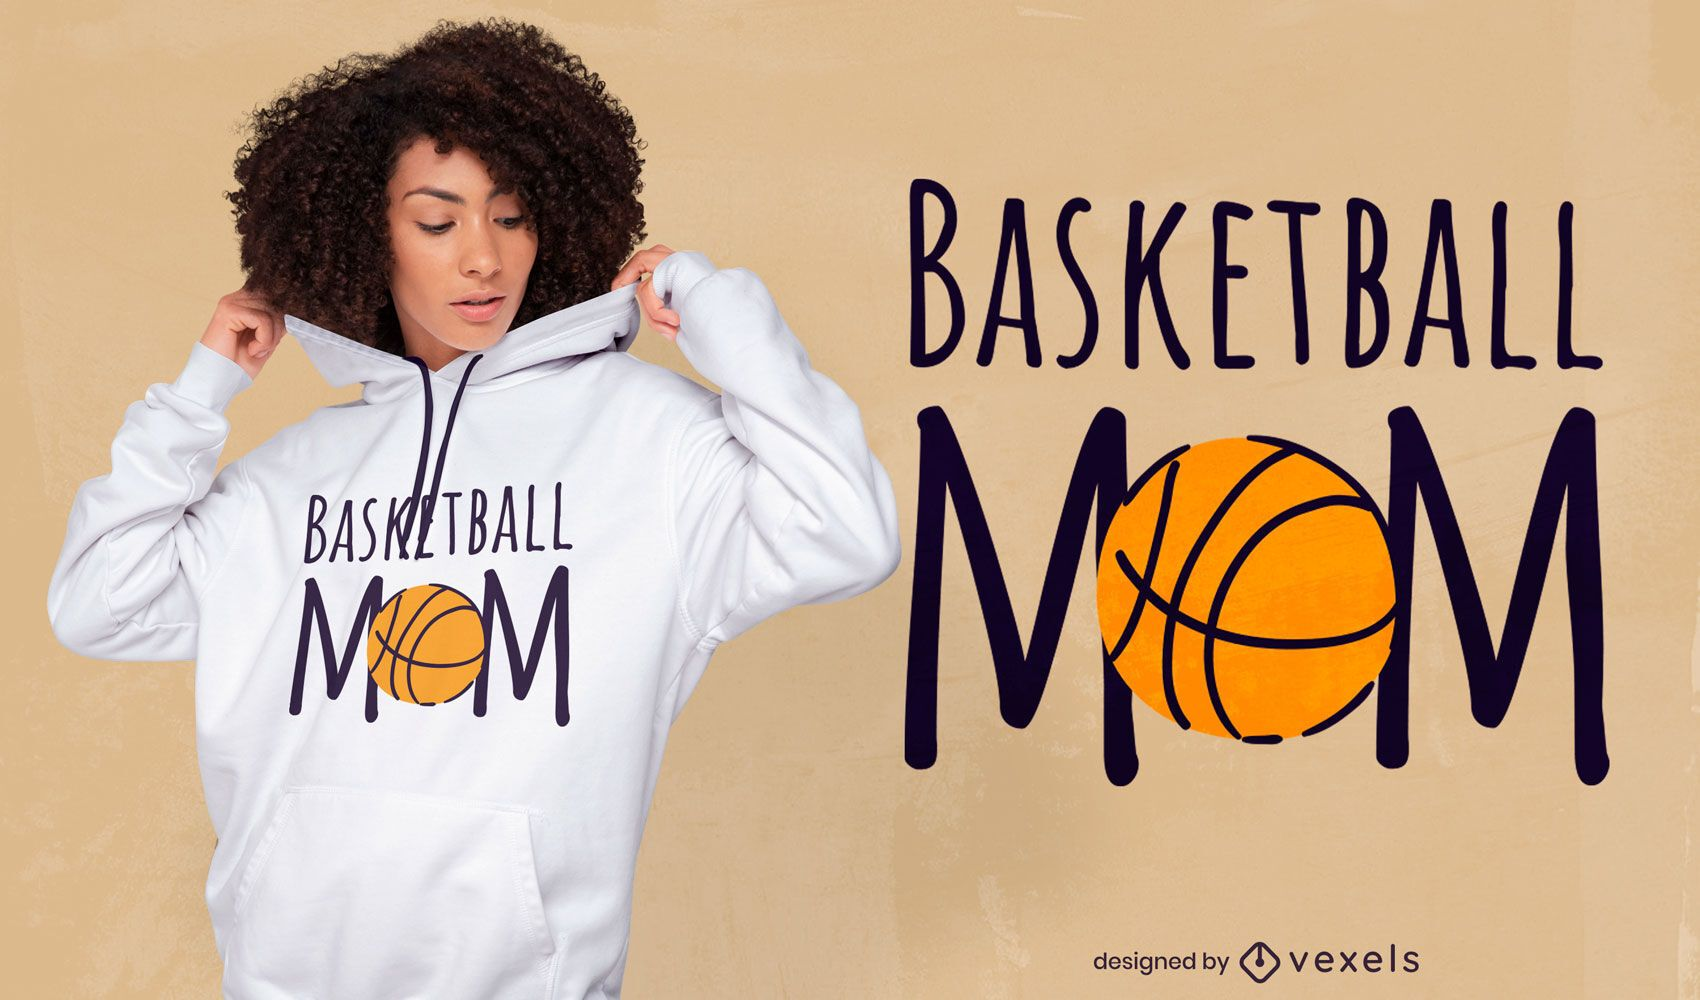 Basketball sport mom quote t-shirt design